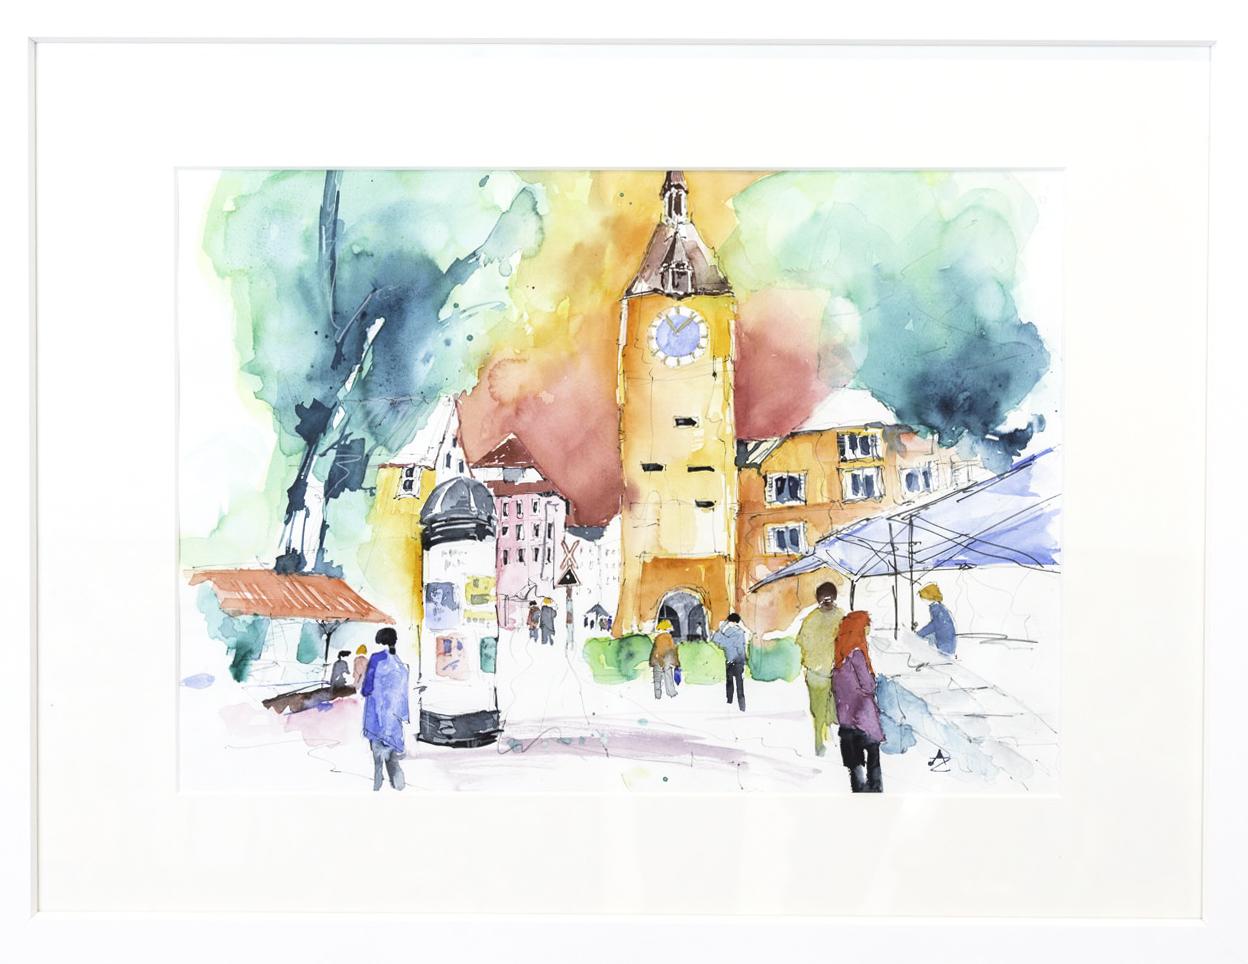 """Markttag"" 60x80cm 1,250.-"